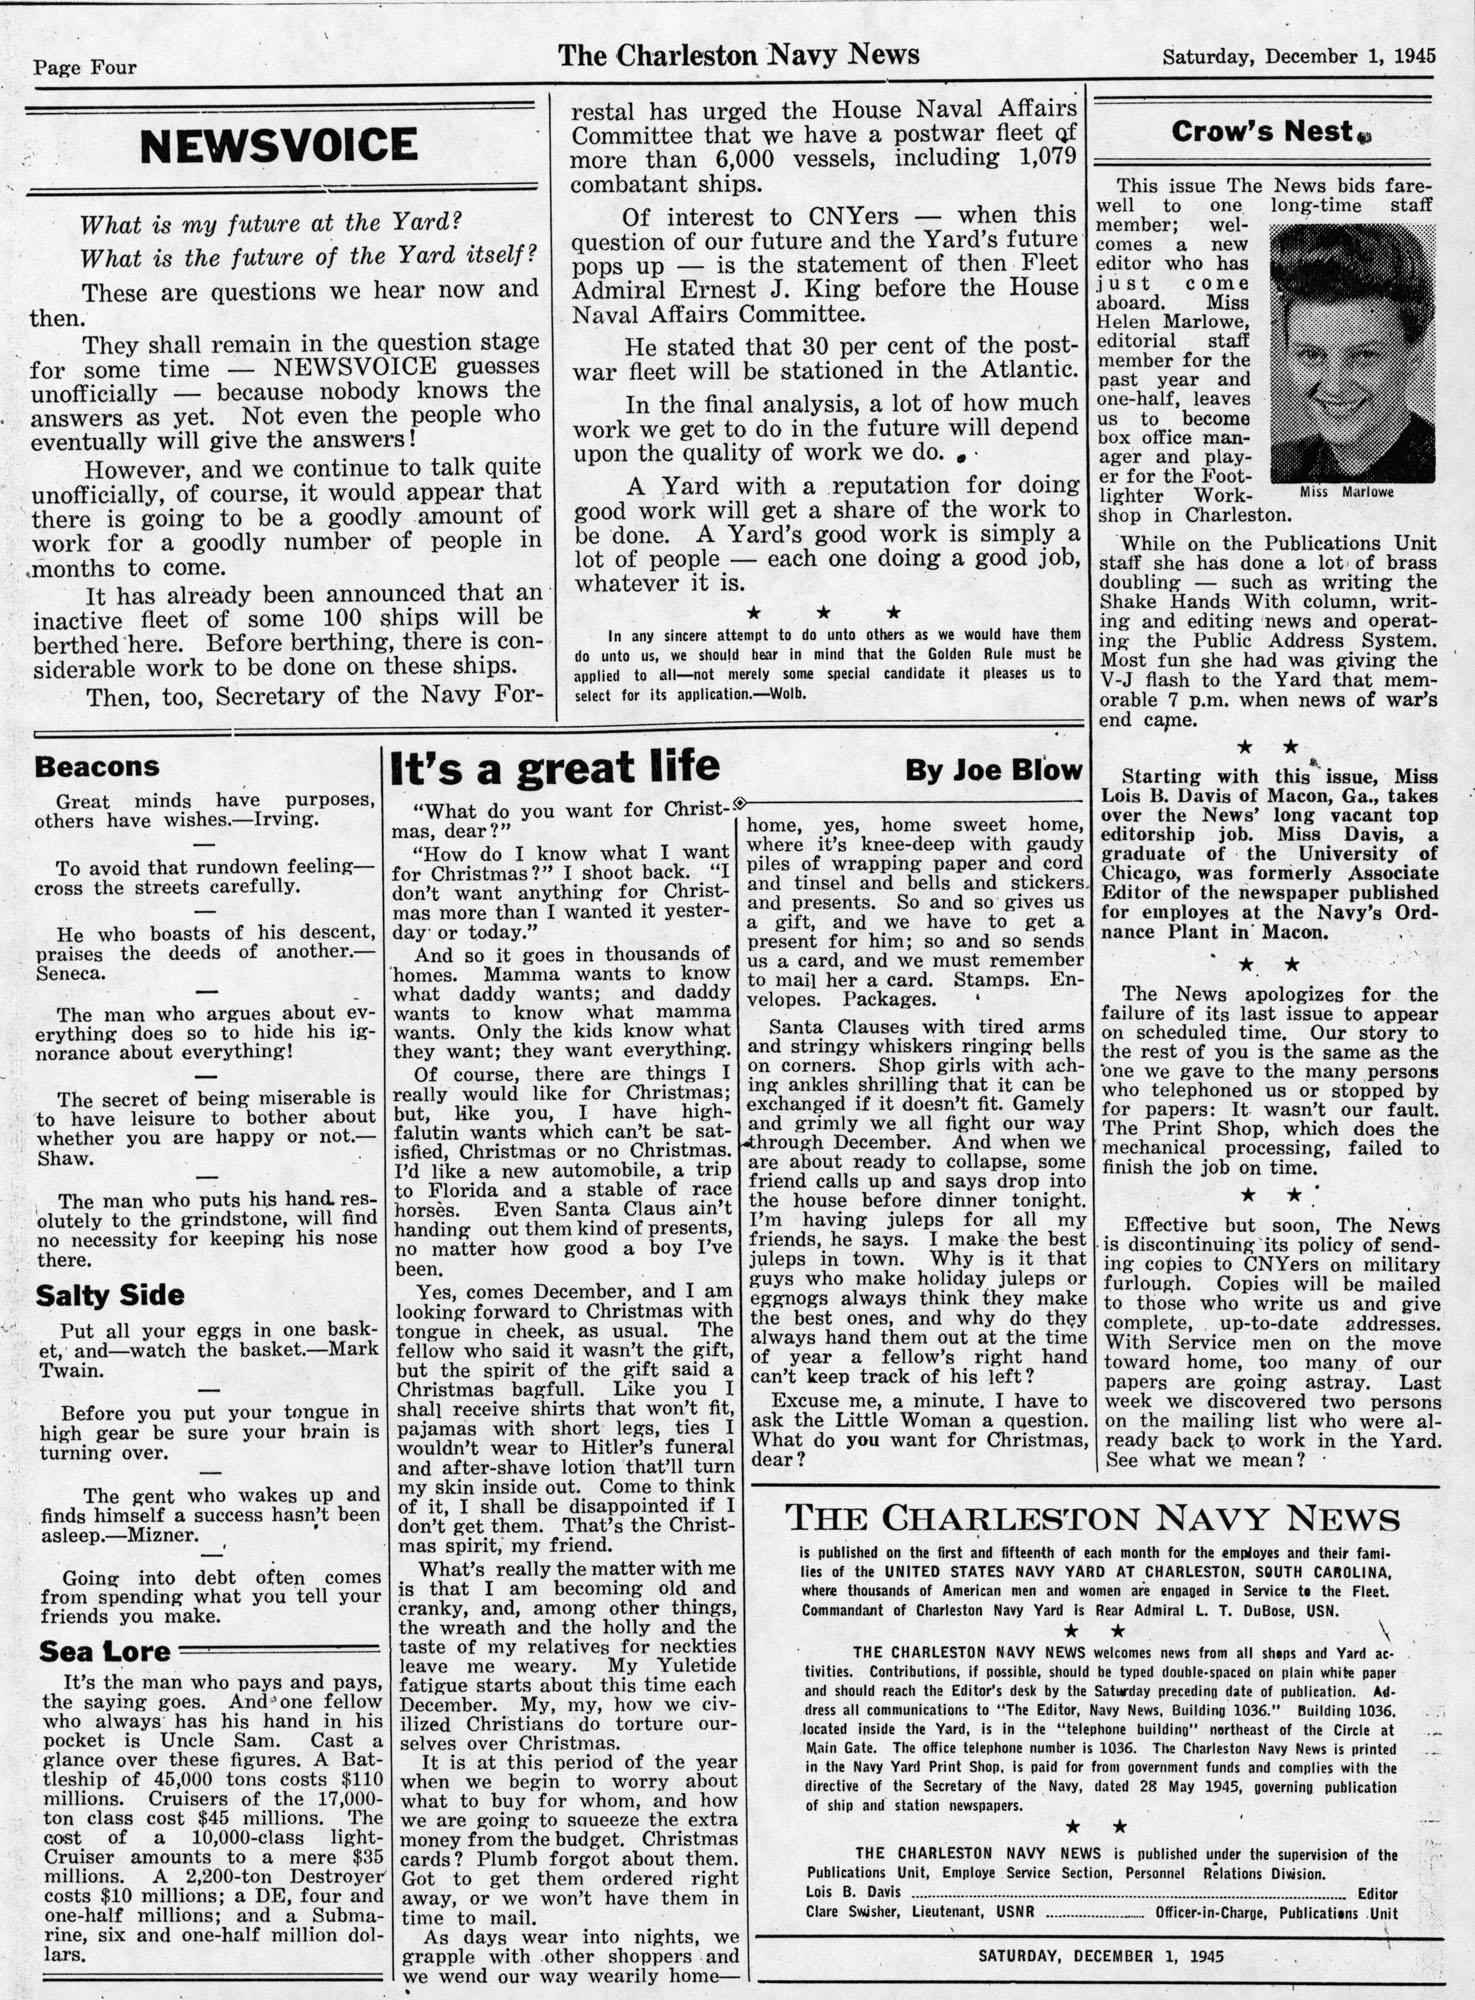 The Charleston Navy News, Volume 4, Edition 11, page iv